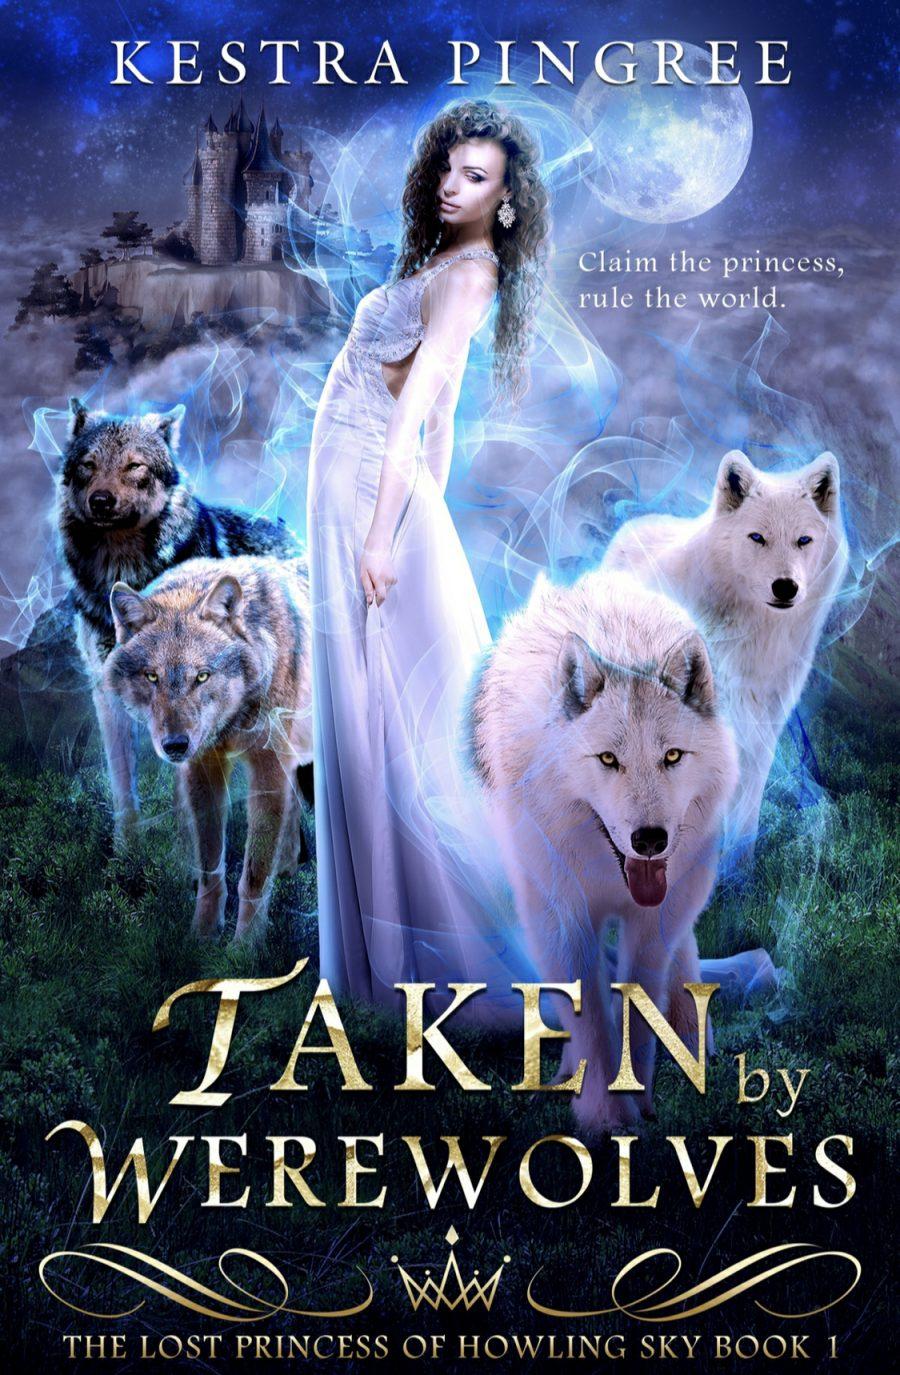 Taken by Werewolves by Kestra Pingree - A Book Review #SlowBurn #RH #Fantasy #4stars #SeriesComplete #ReverseHarem #WhyChoose #KU #KindleUnlimited